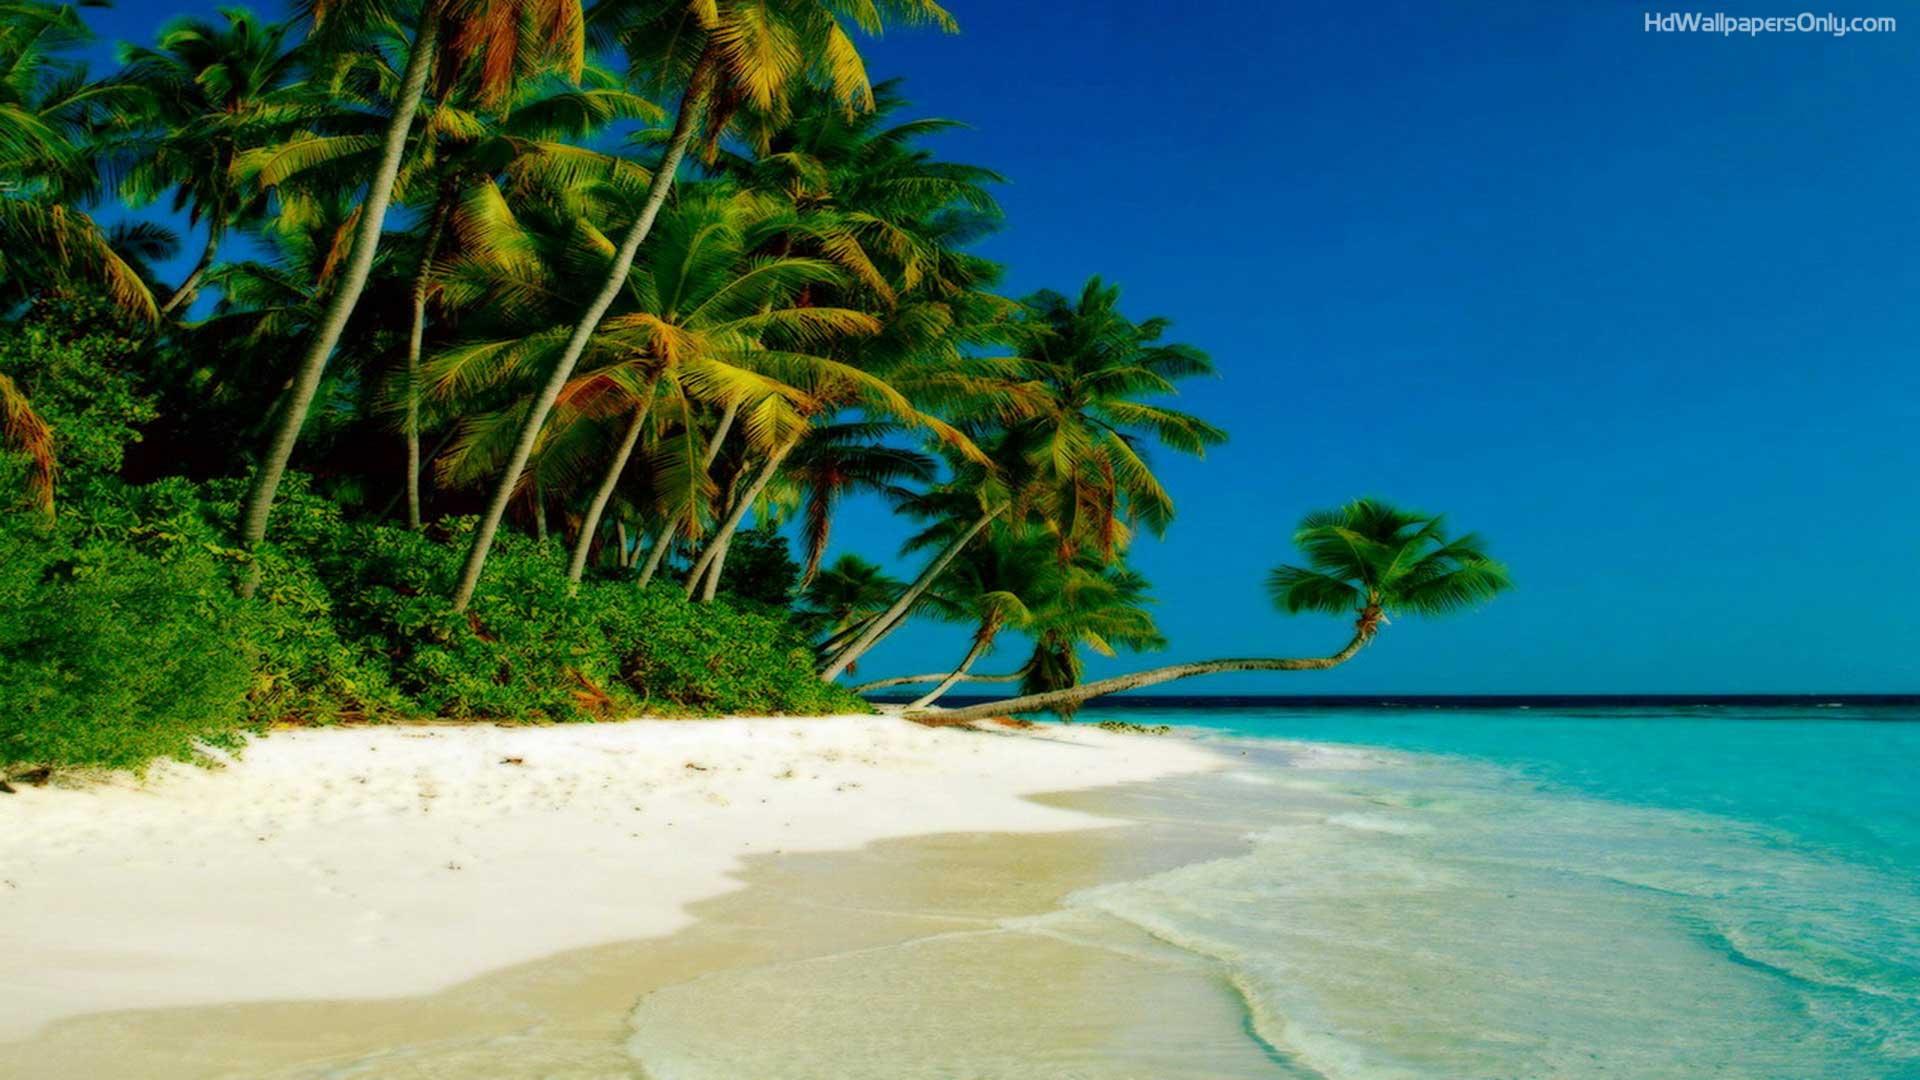 beach-hd-wallpaper.1080p.jpg